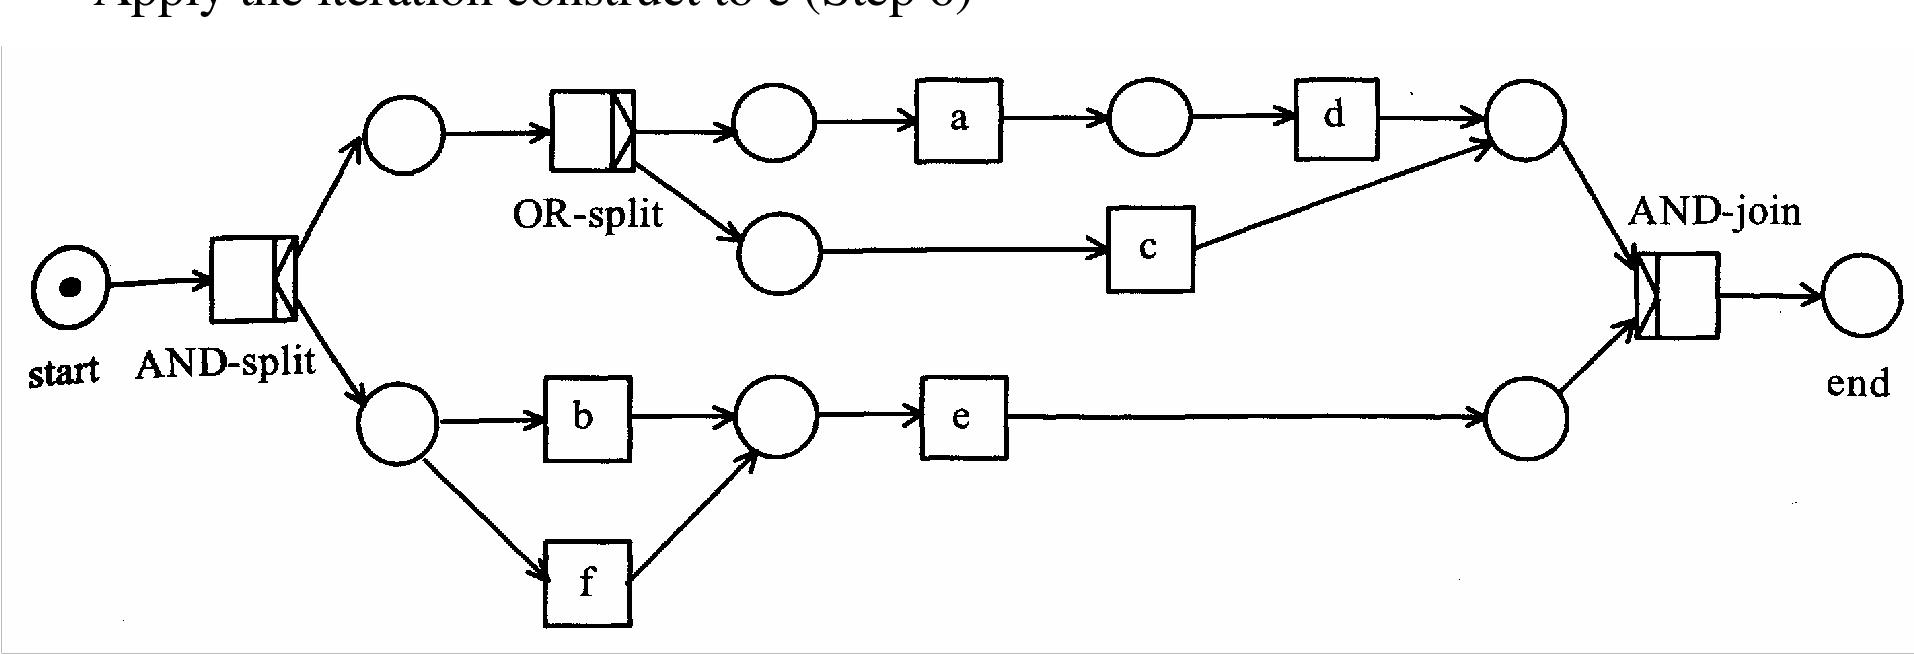 figure 4.18